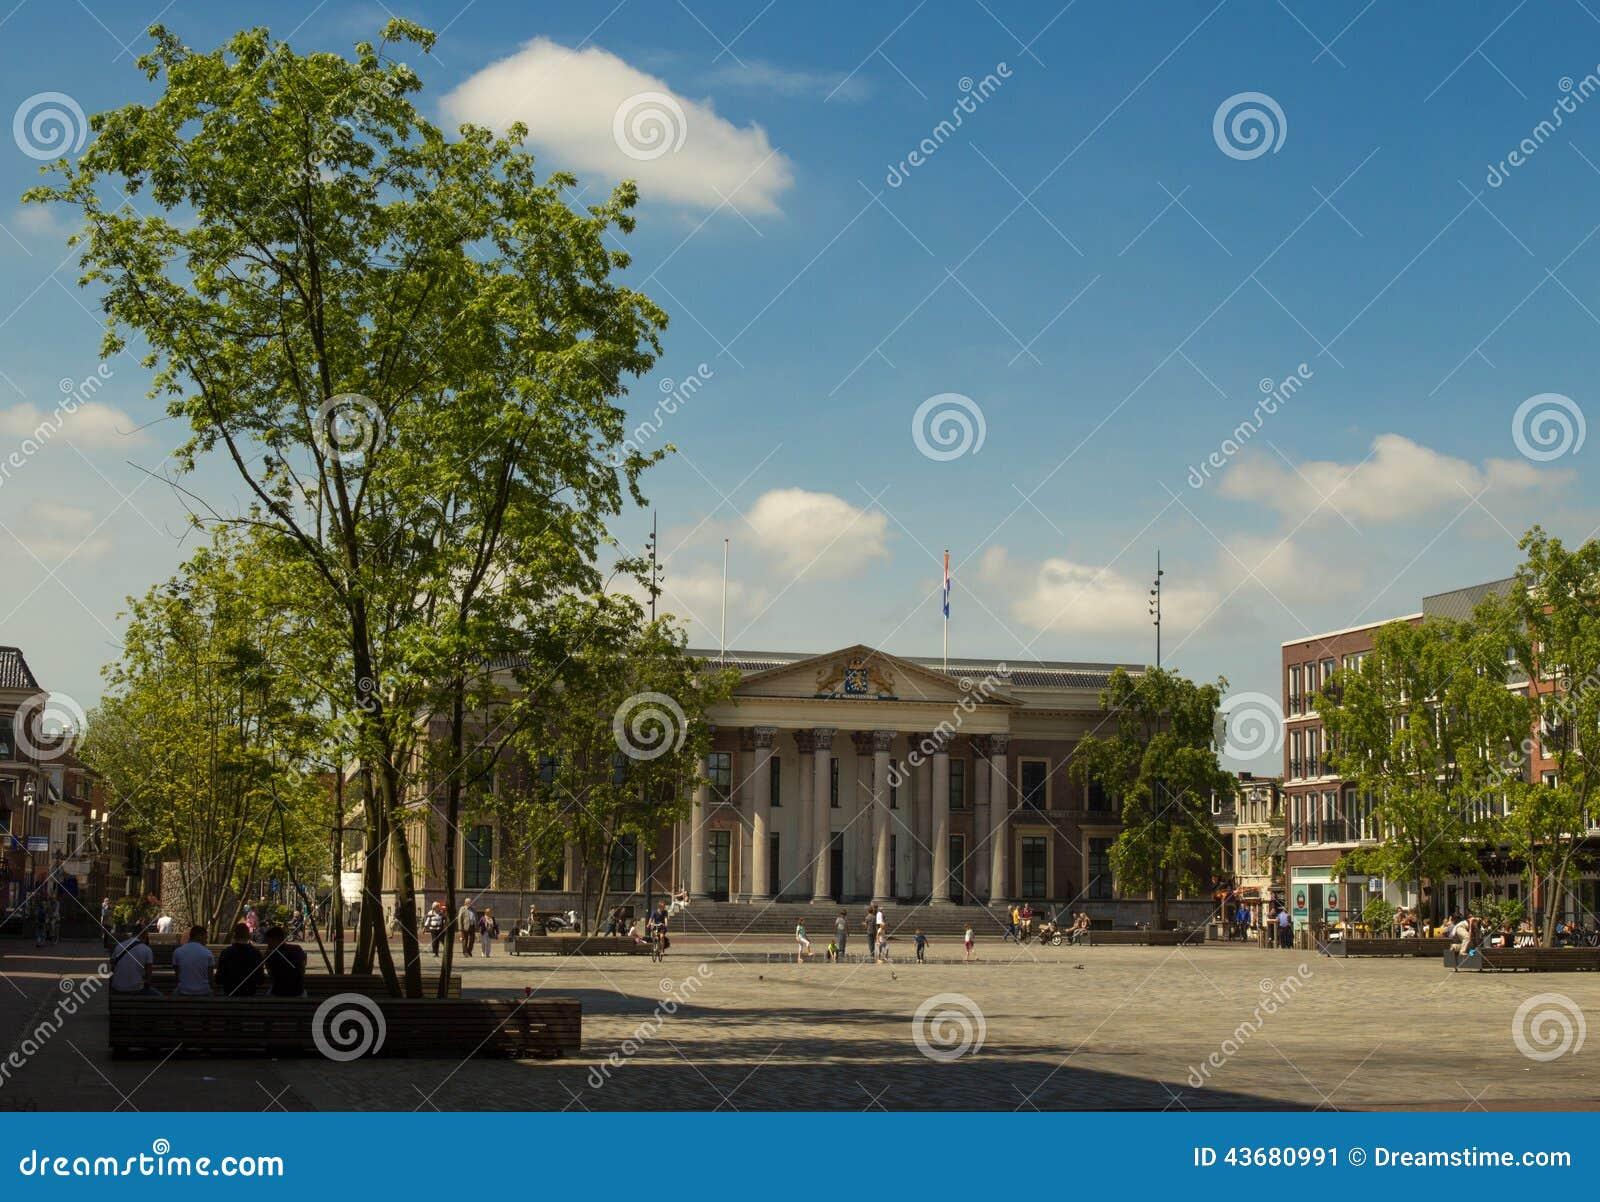 Leeuwarden Courthouse and Wilhelminaplein